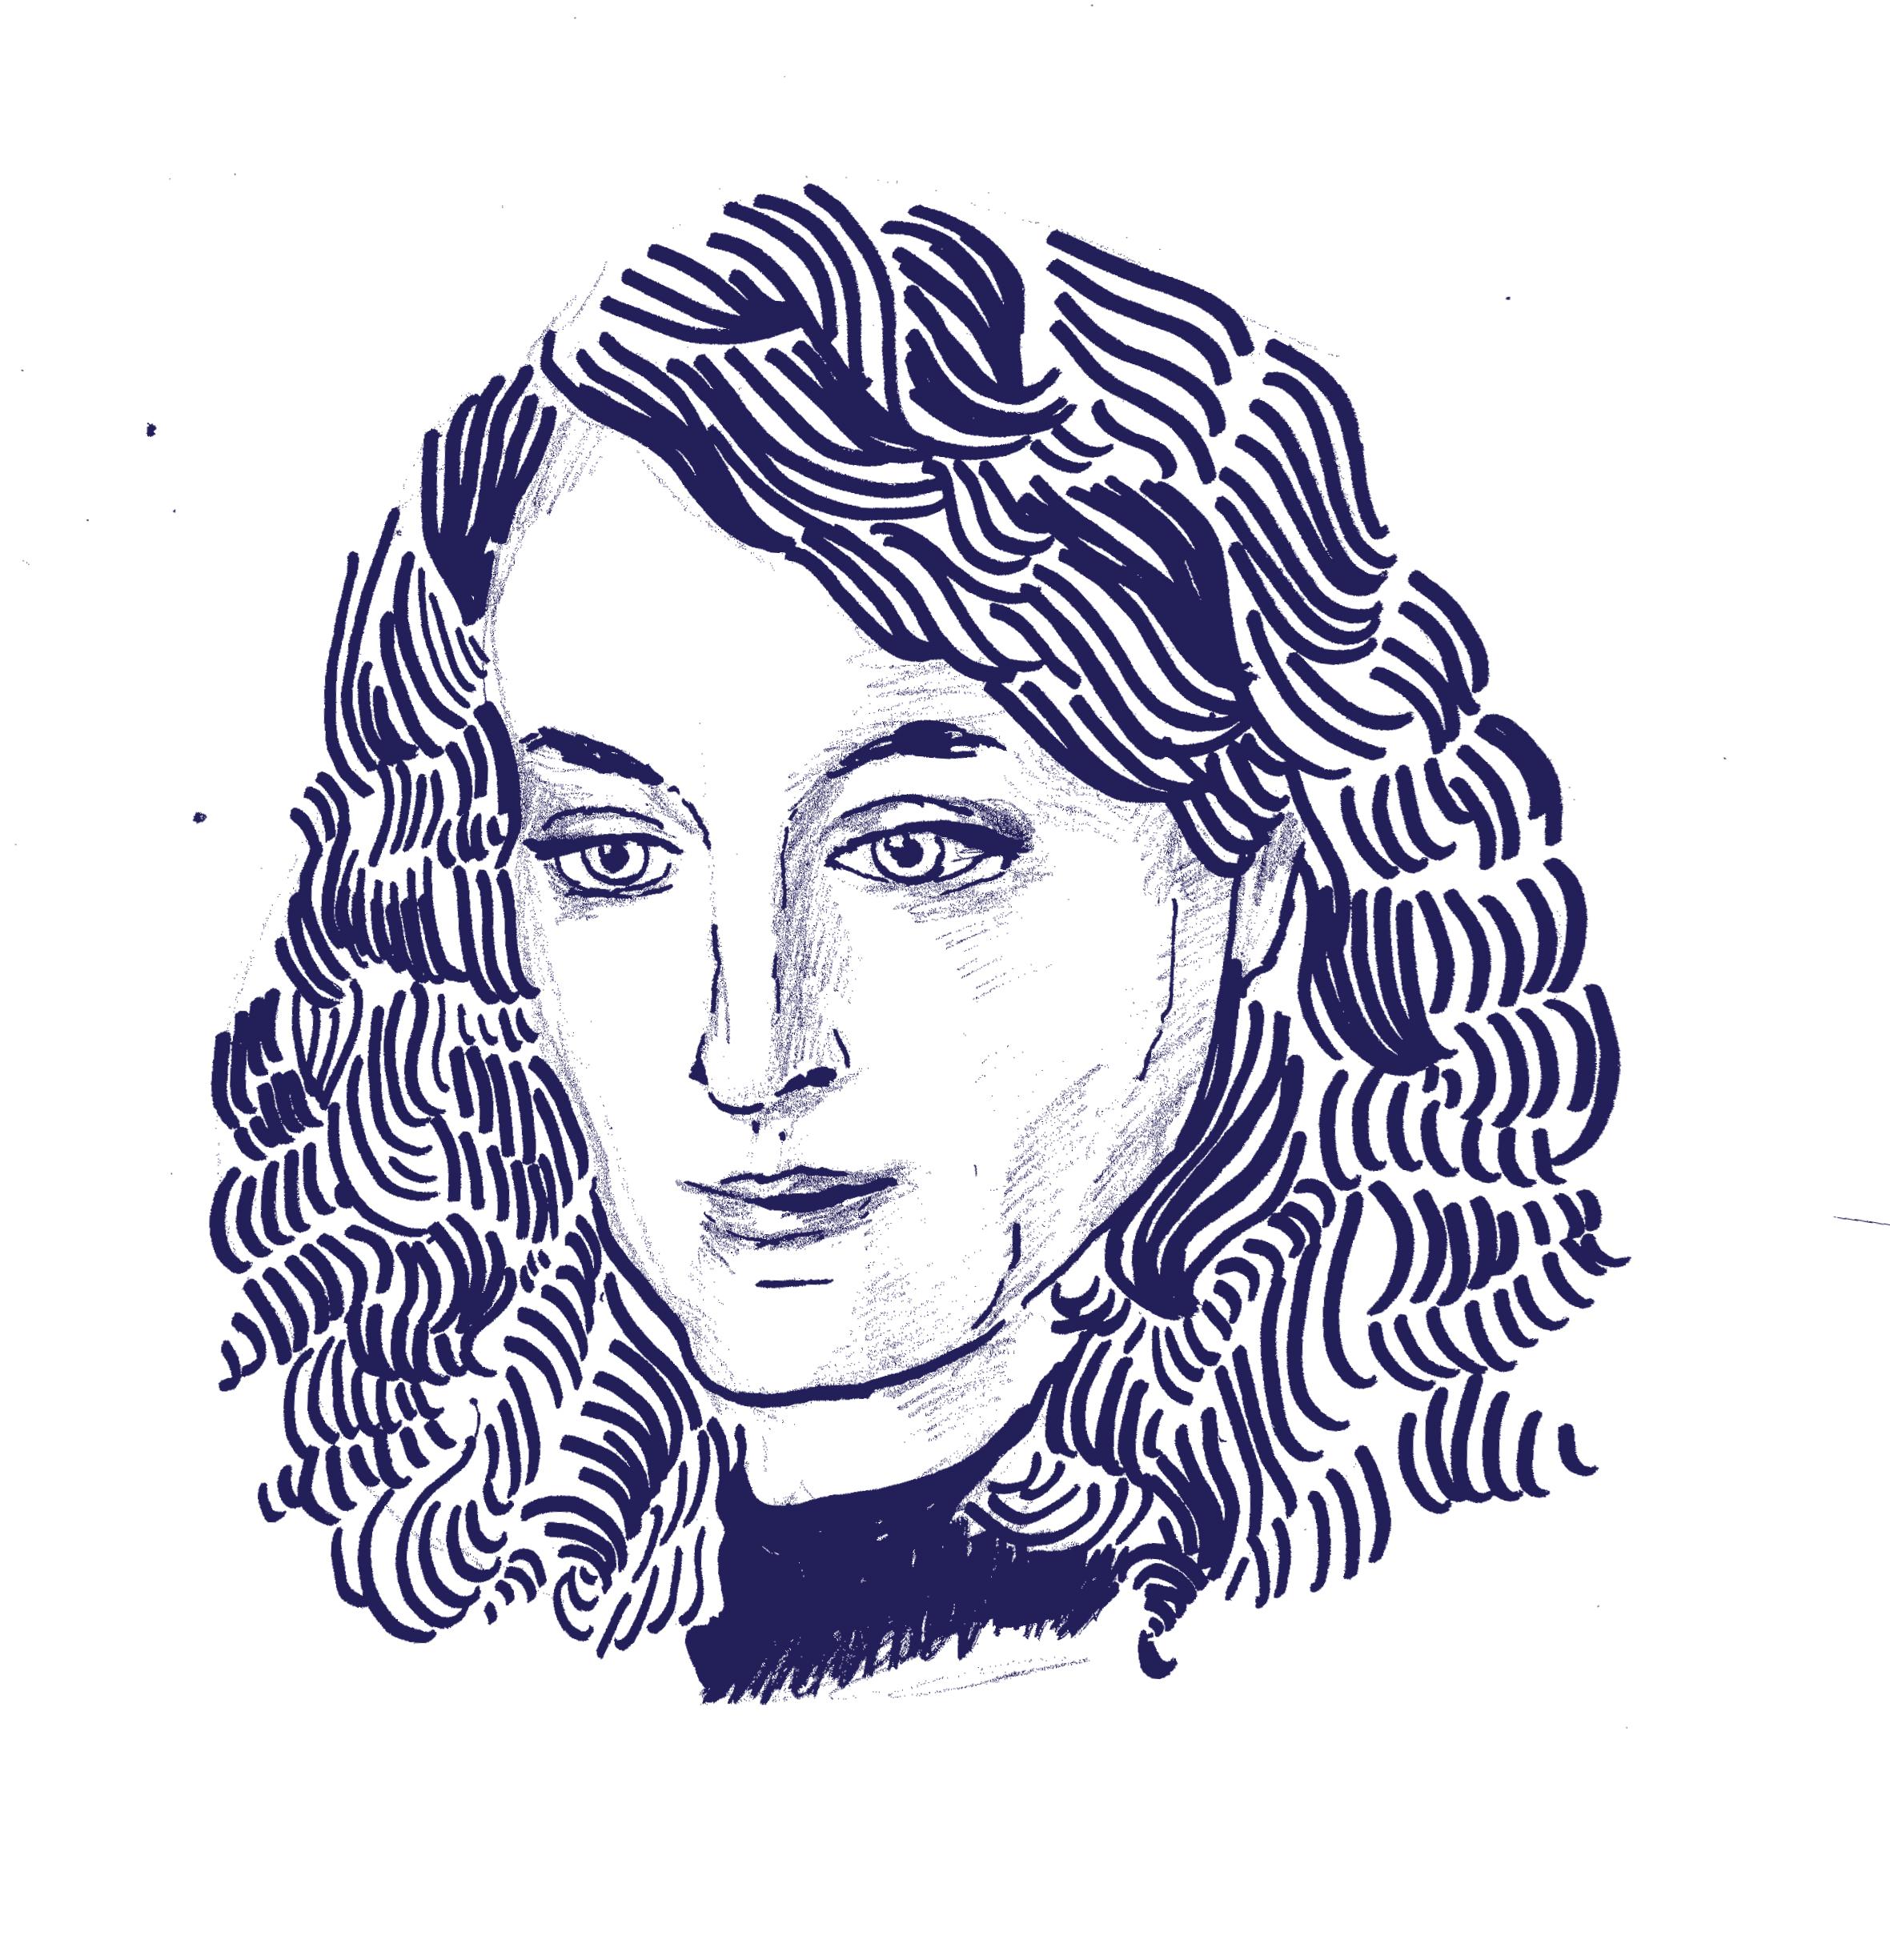 rosie-pringle-self-portrait